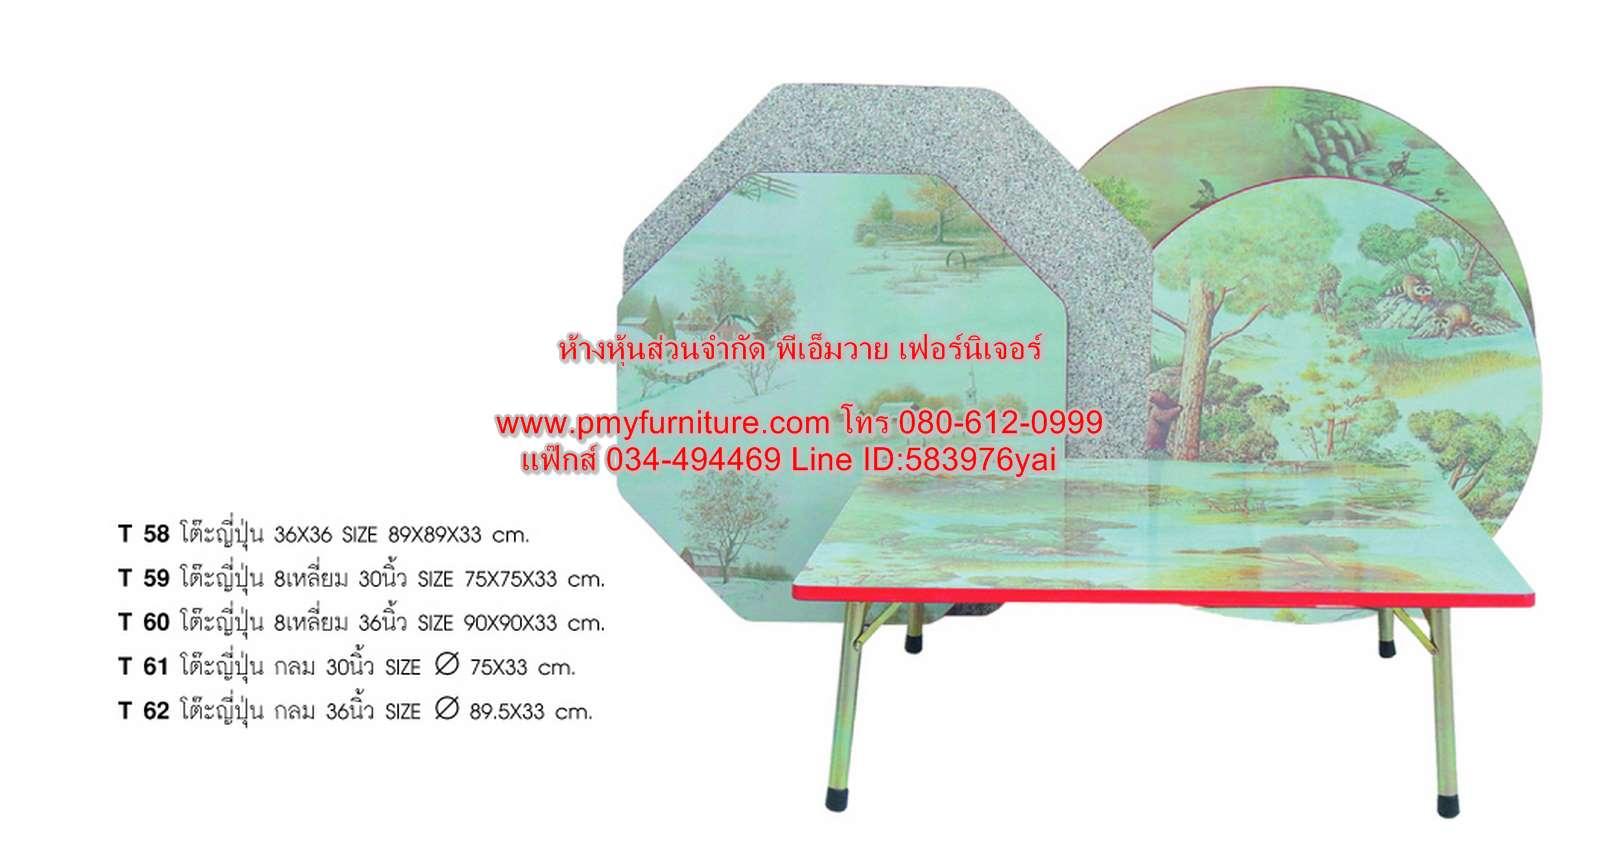 PMY24-10 โต๊ะญี่ปุ่นแบบเหลี่ยม แบบกลม แบบ8เหลี่ยม